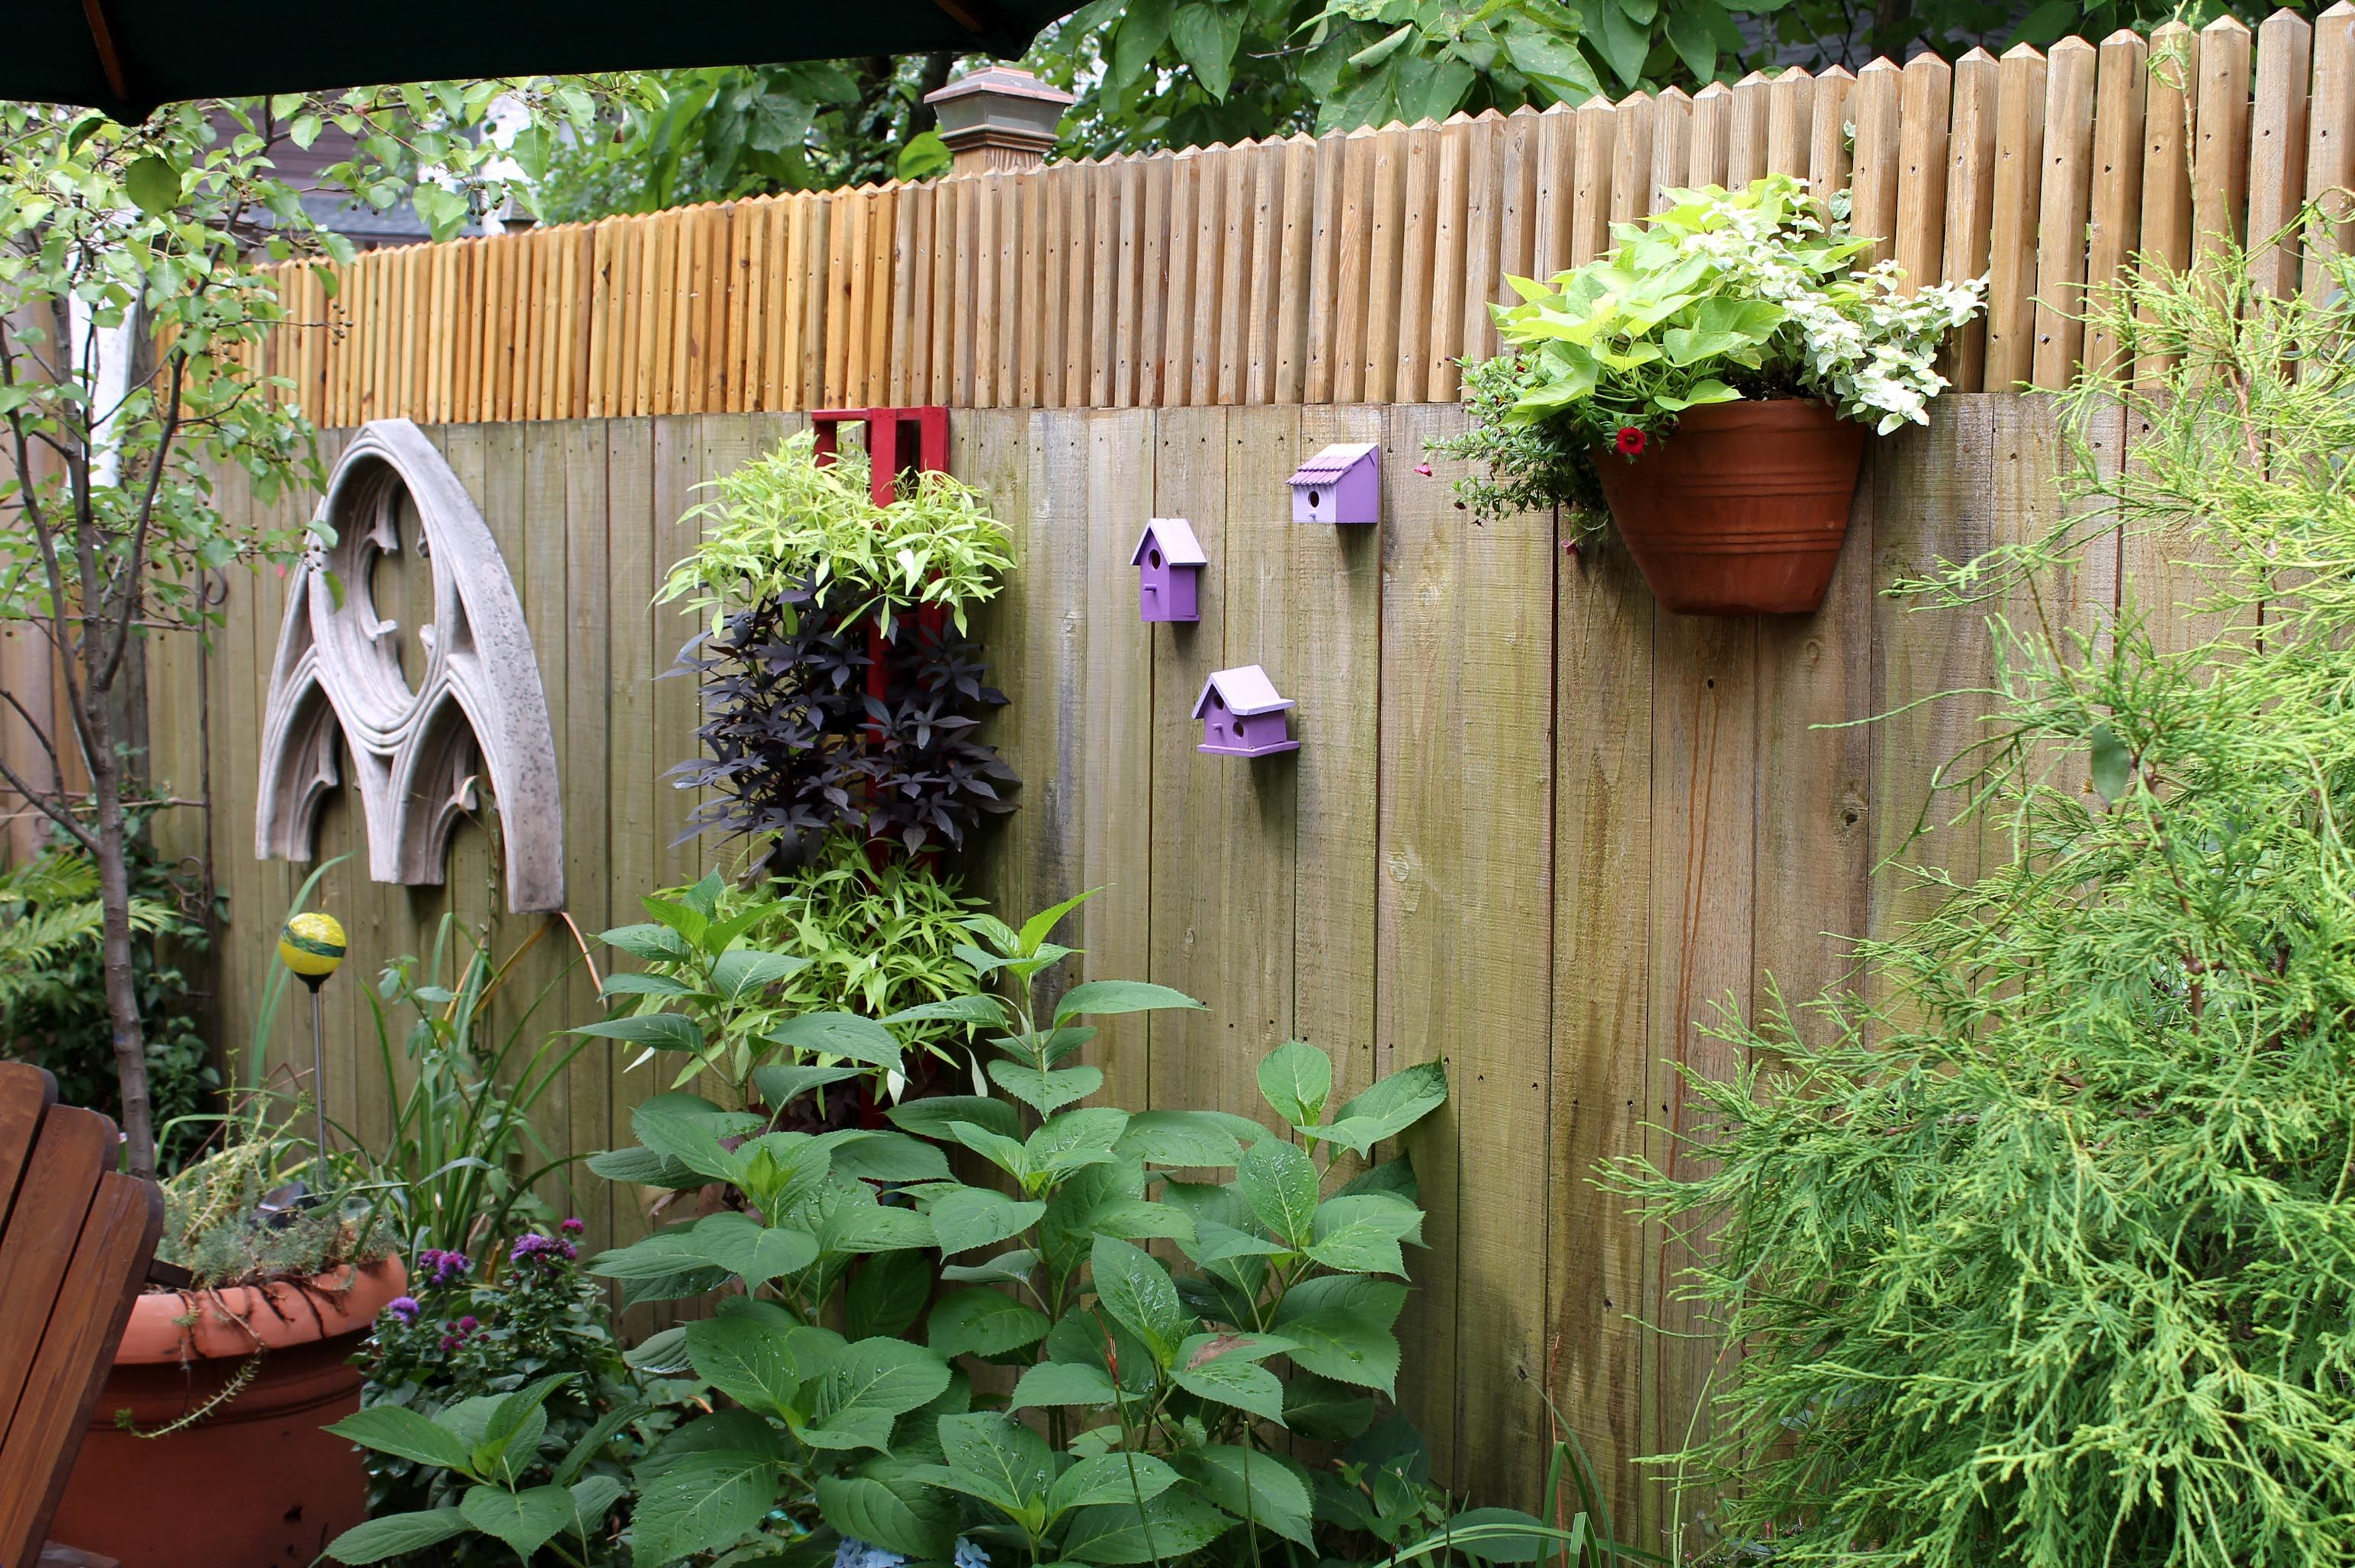 Pin by lynn anderson on garden pinterest garden fence and backyard